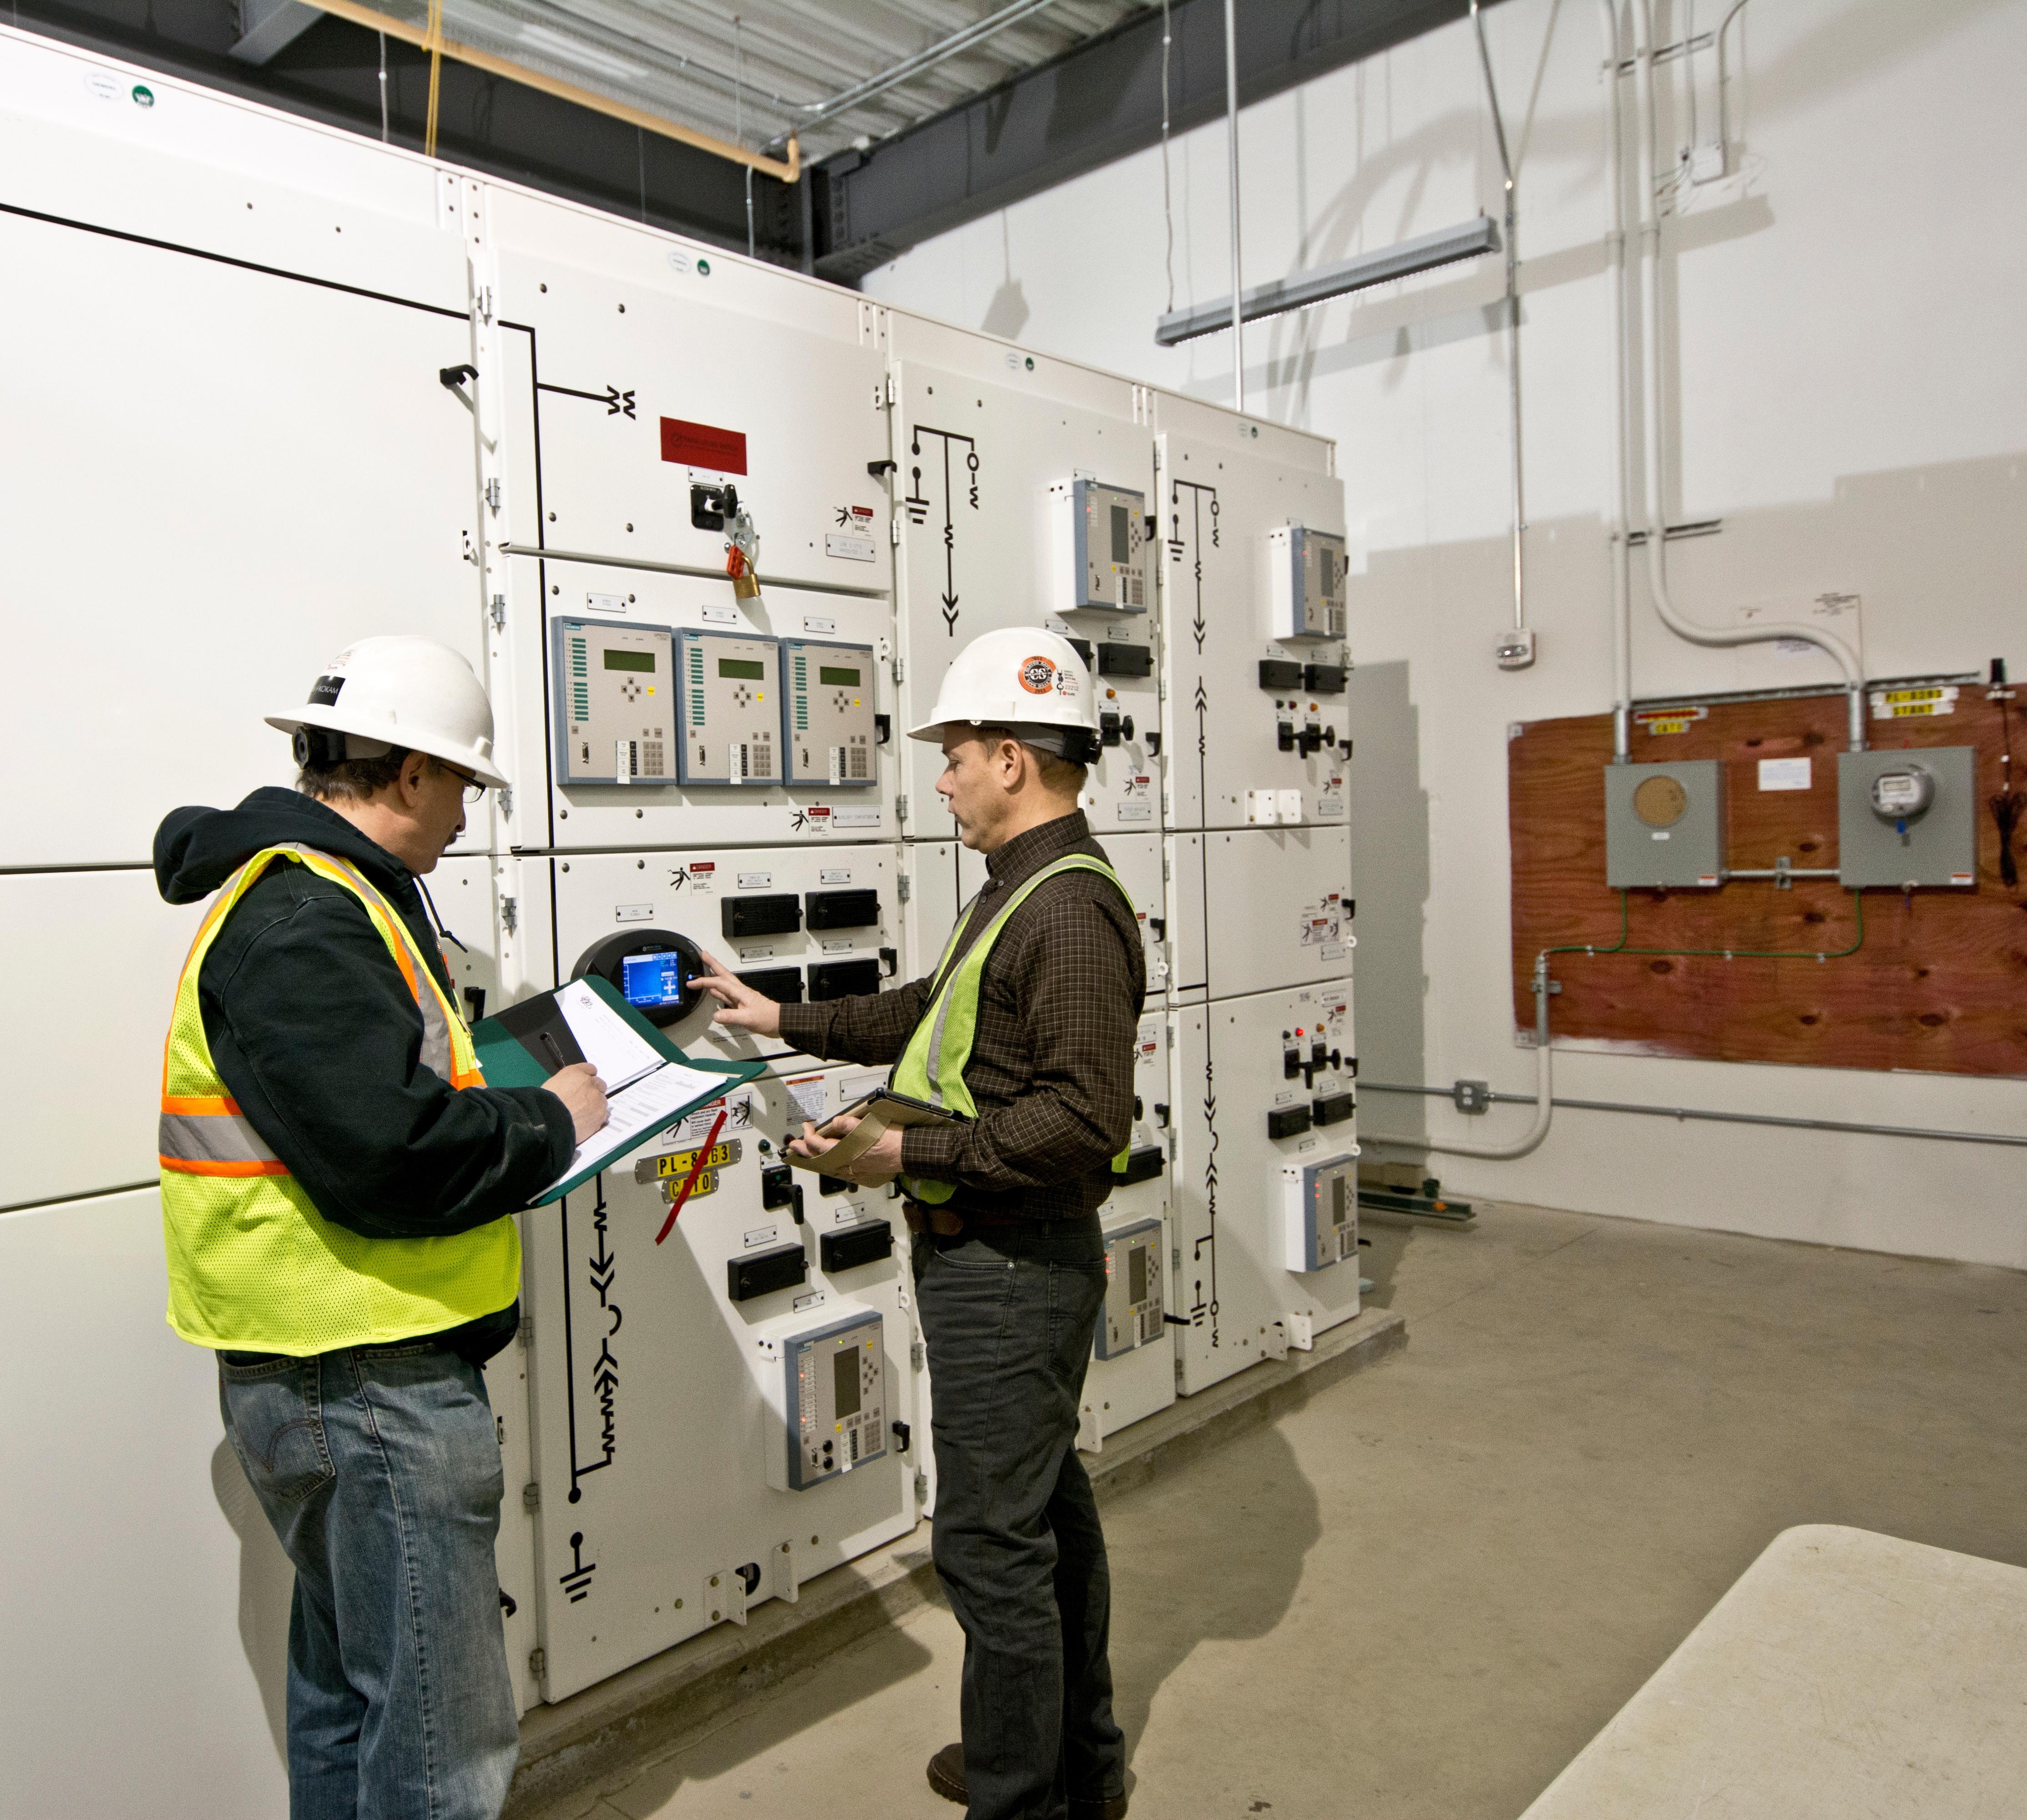 Vice President A. Luzenski, PE, CEM, LEED AP of PBA, Shares 'Top 5 Benefits of An Energy Assessment'